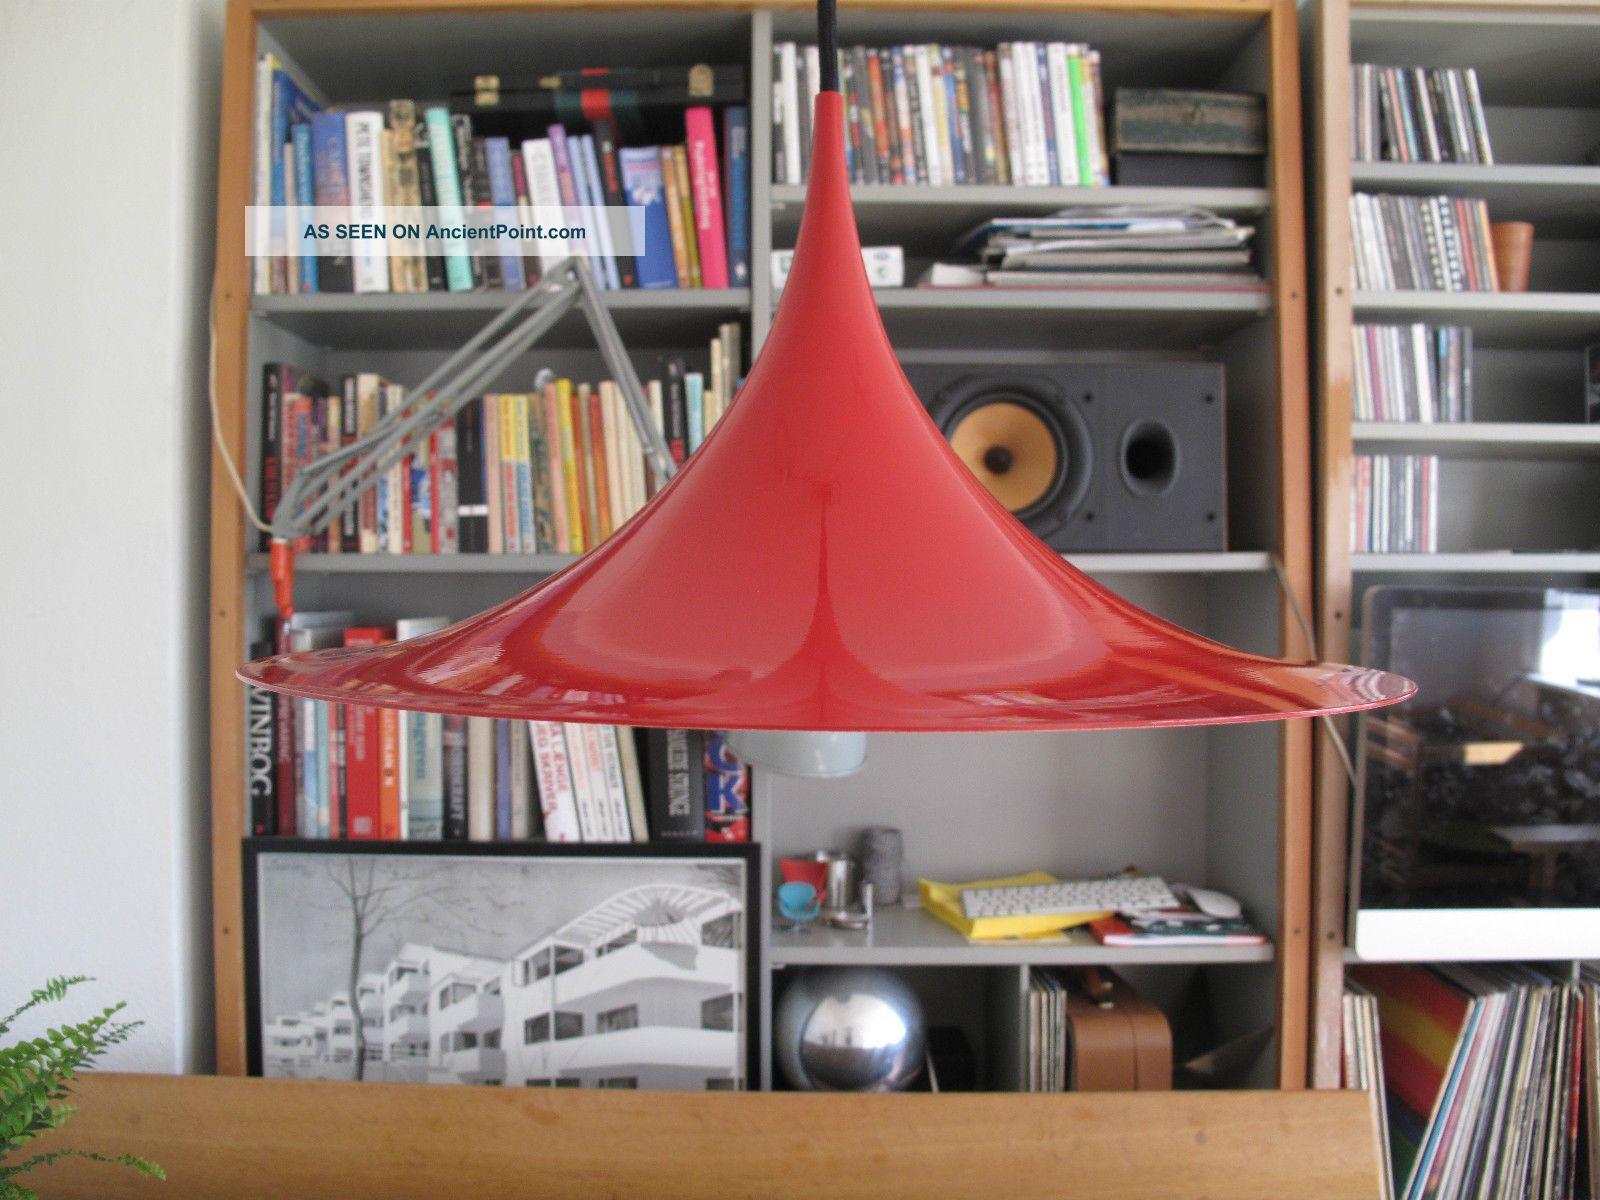 1967 ' S Semi Lamp Thorup Bonderup Fog Morup Danish Modern Space Age Panton Era 20th Century photo